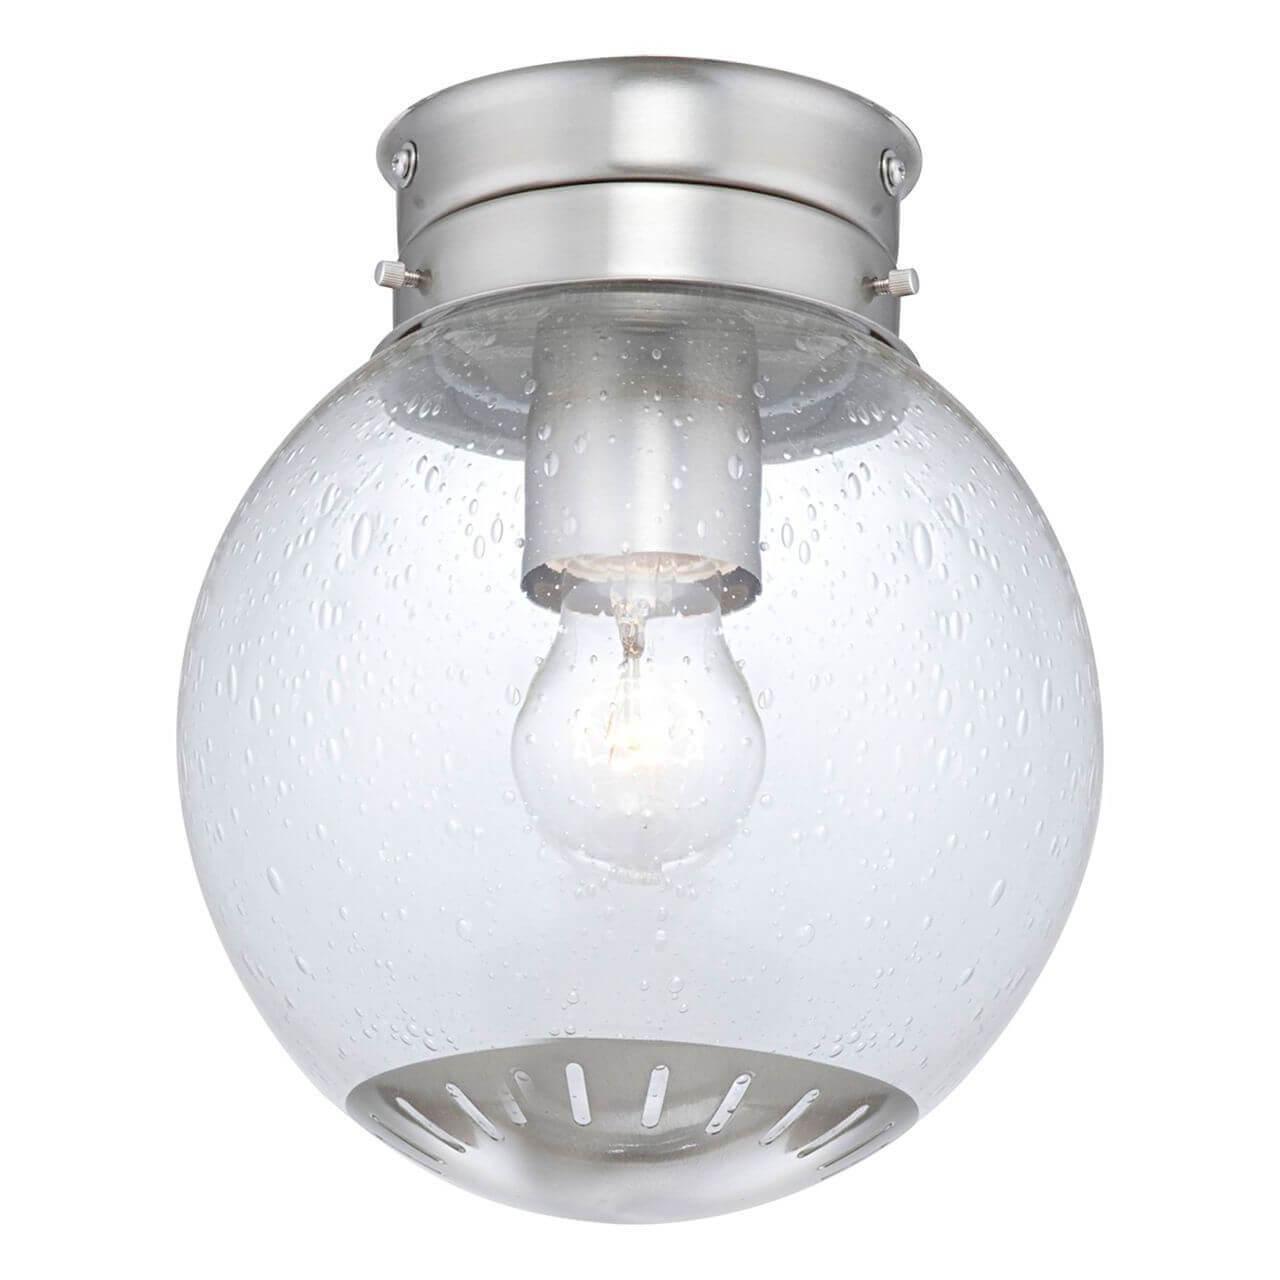 Уличный светильник Globo Bowle II 3180ST globo фонарь bowle ii 1xe27x60 вт 110 см qvhilta